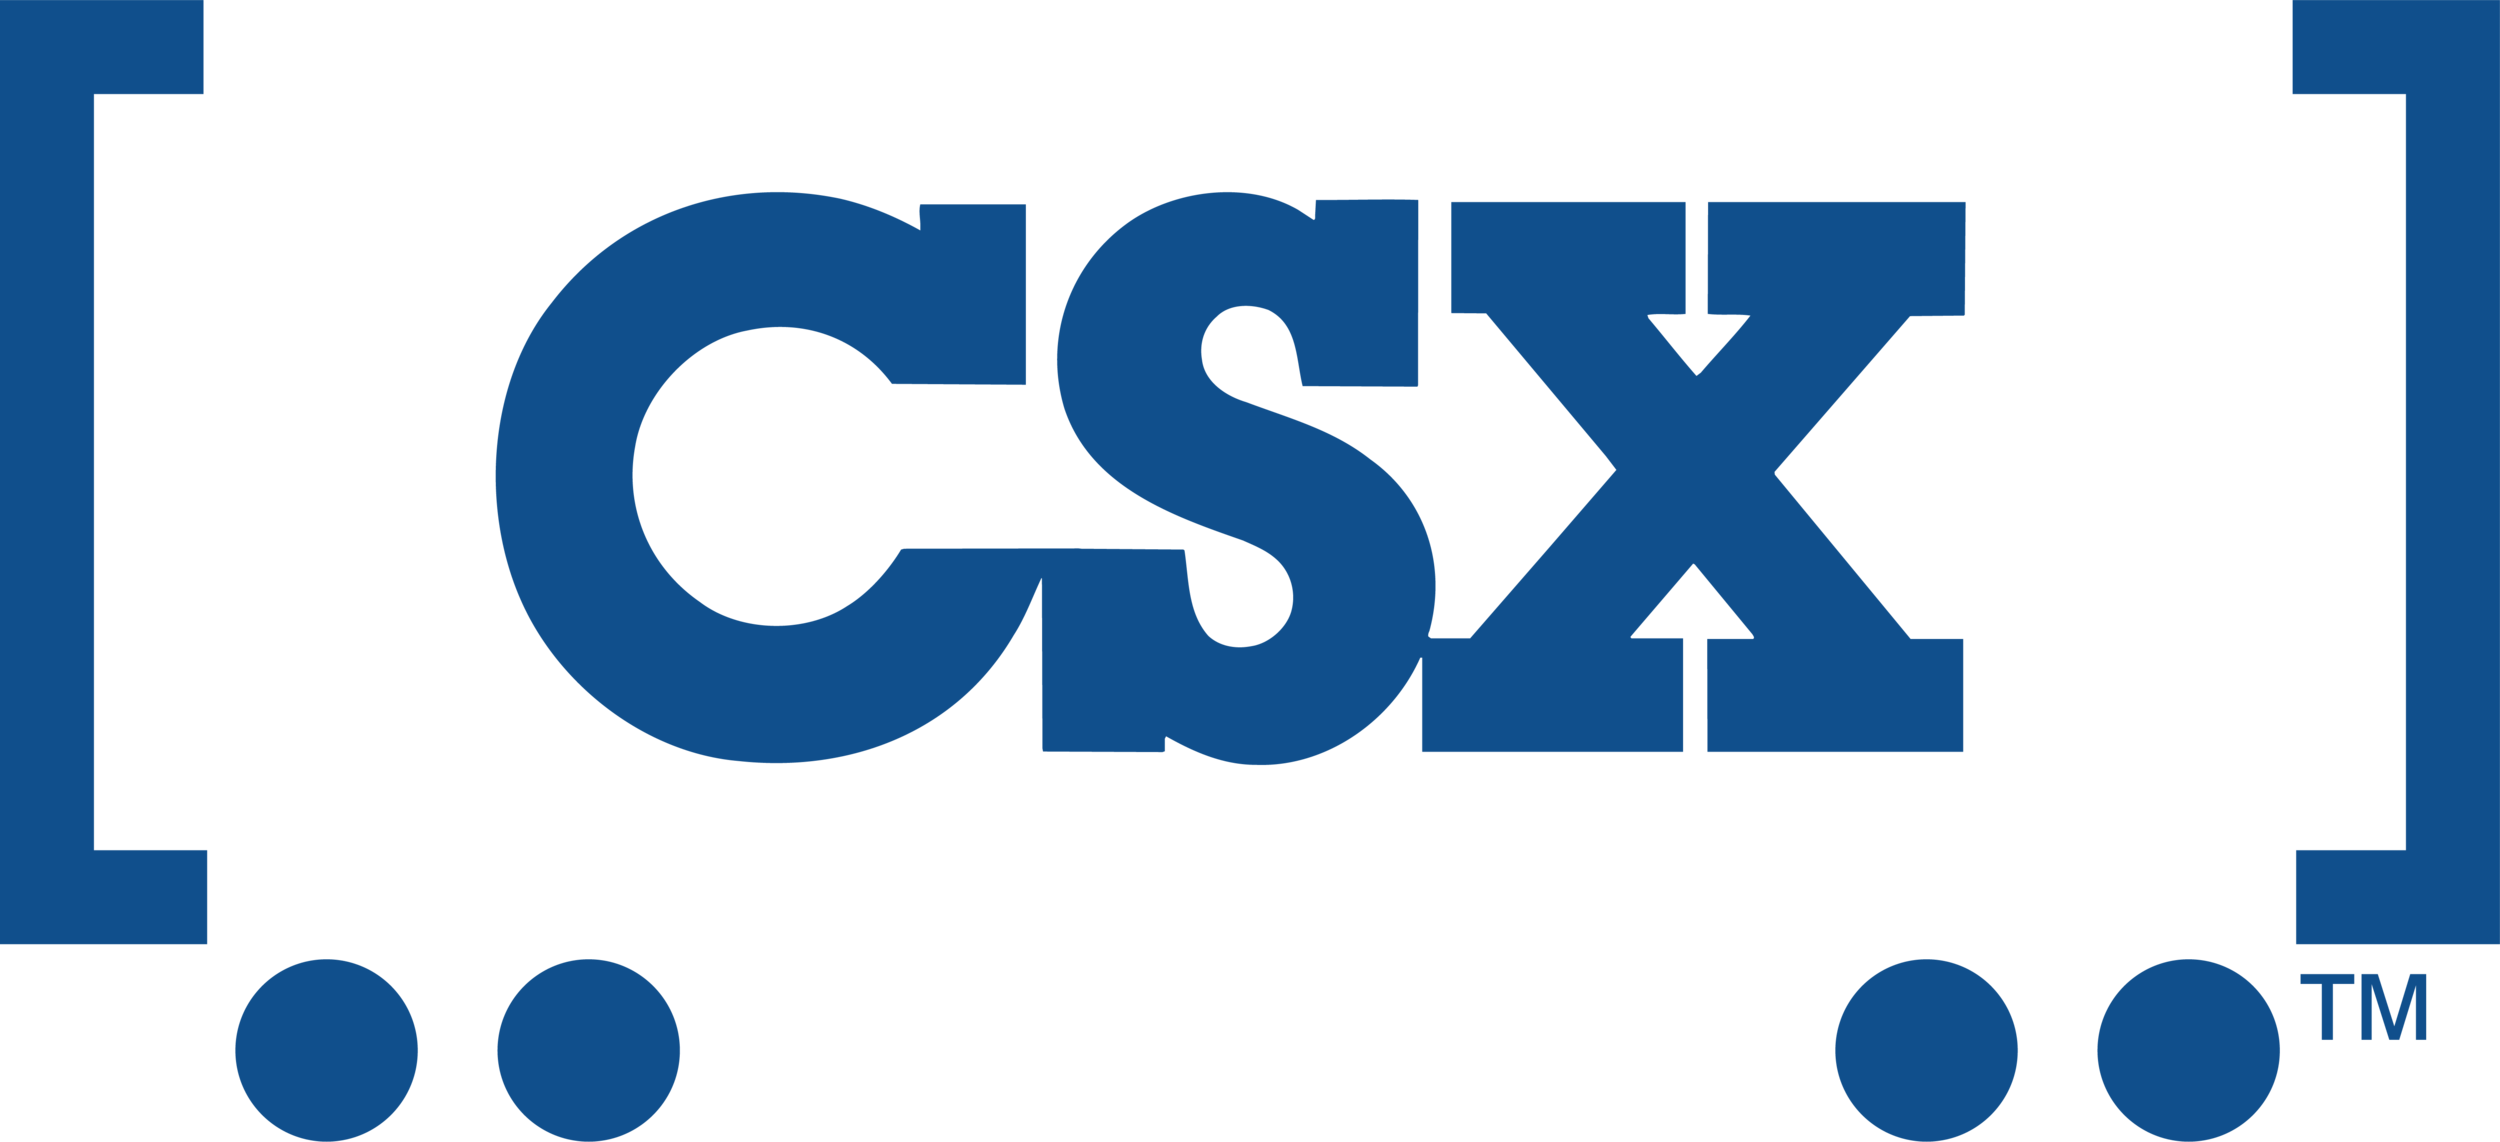 15 CSX Logo.png